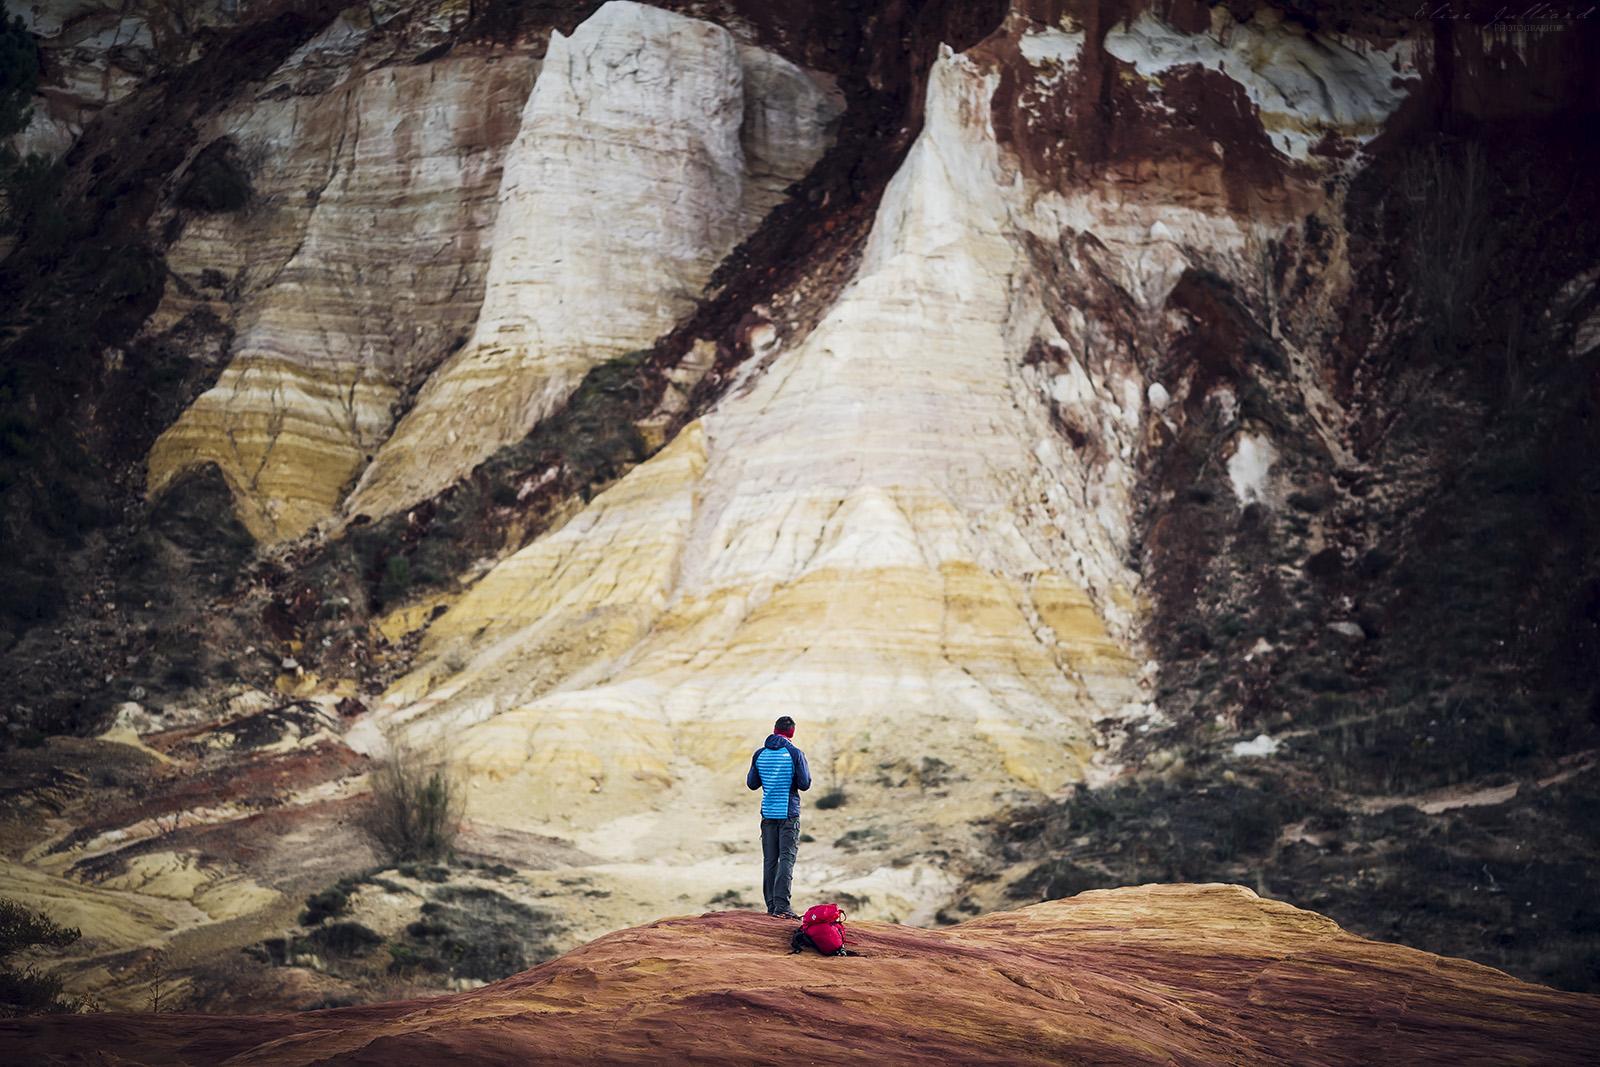 colorado-provencal-rustrel-vaucluse-parc-naturel-regional-luberon-provence-alpes-cote-dazur-carriere-ocre-france-paysage-desert-photographe-elise-julliard-apt-paca